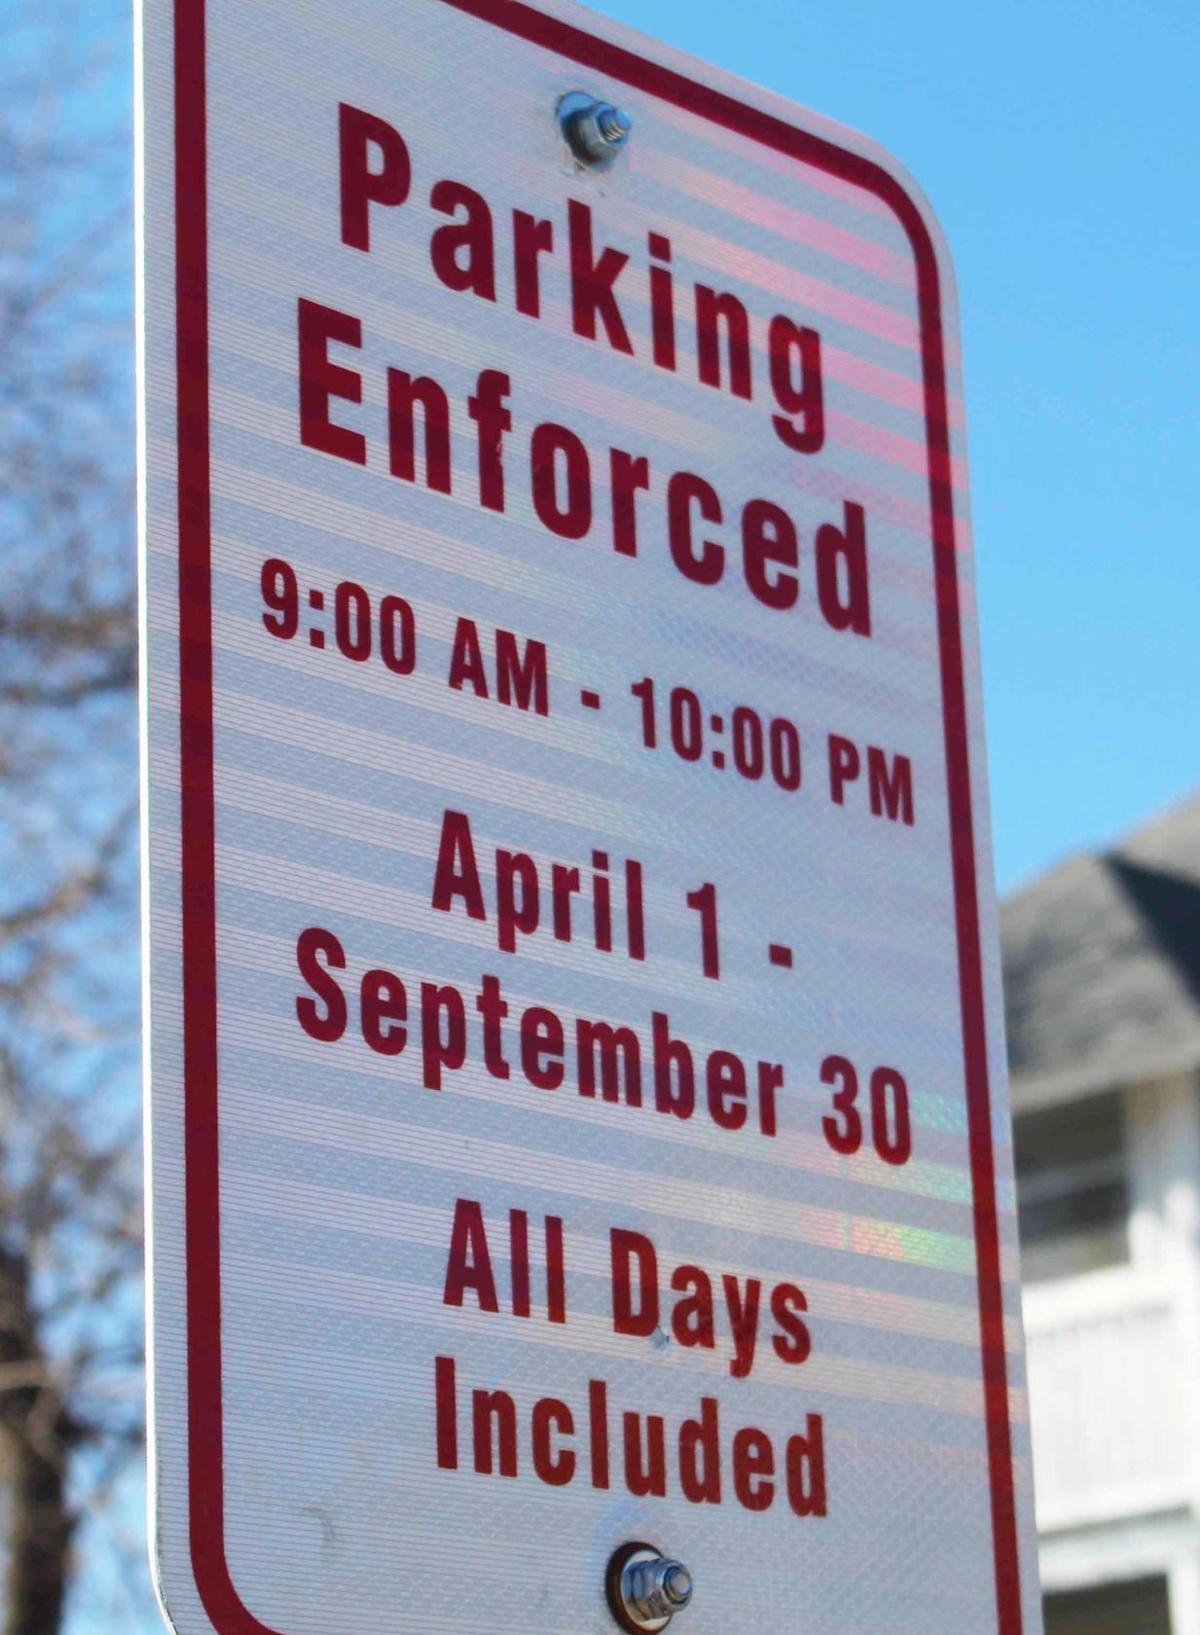 Wisconsin Dells parking enforcement sign